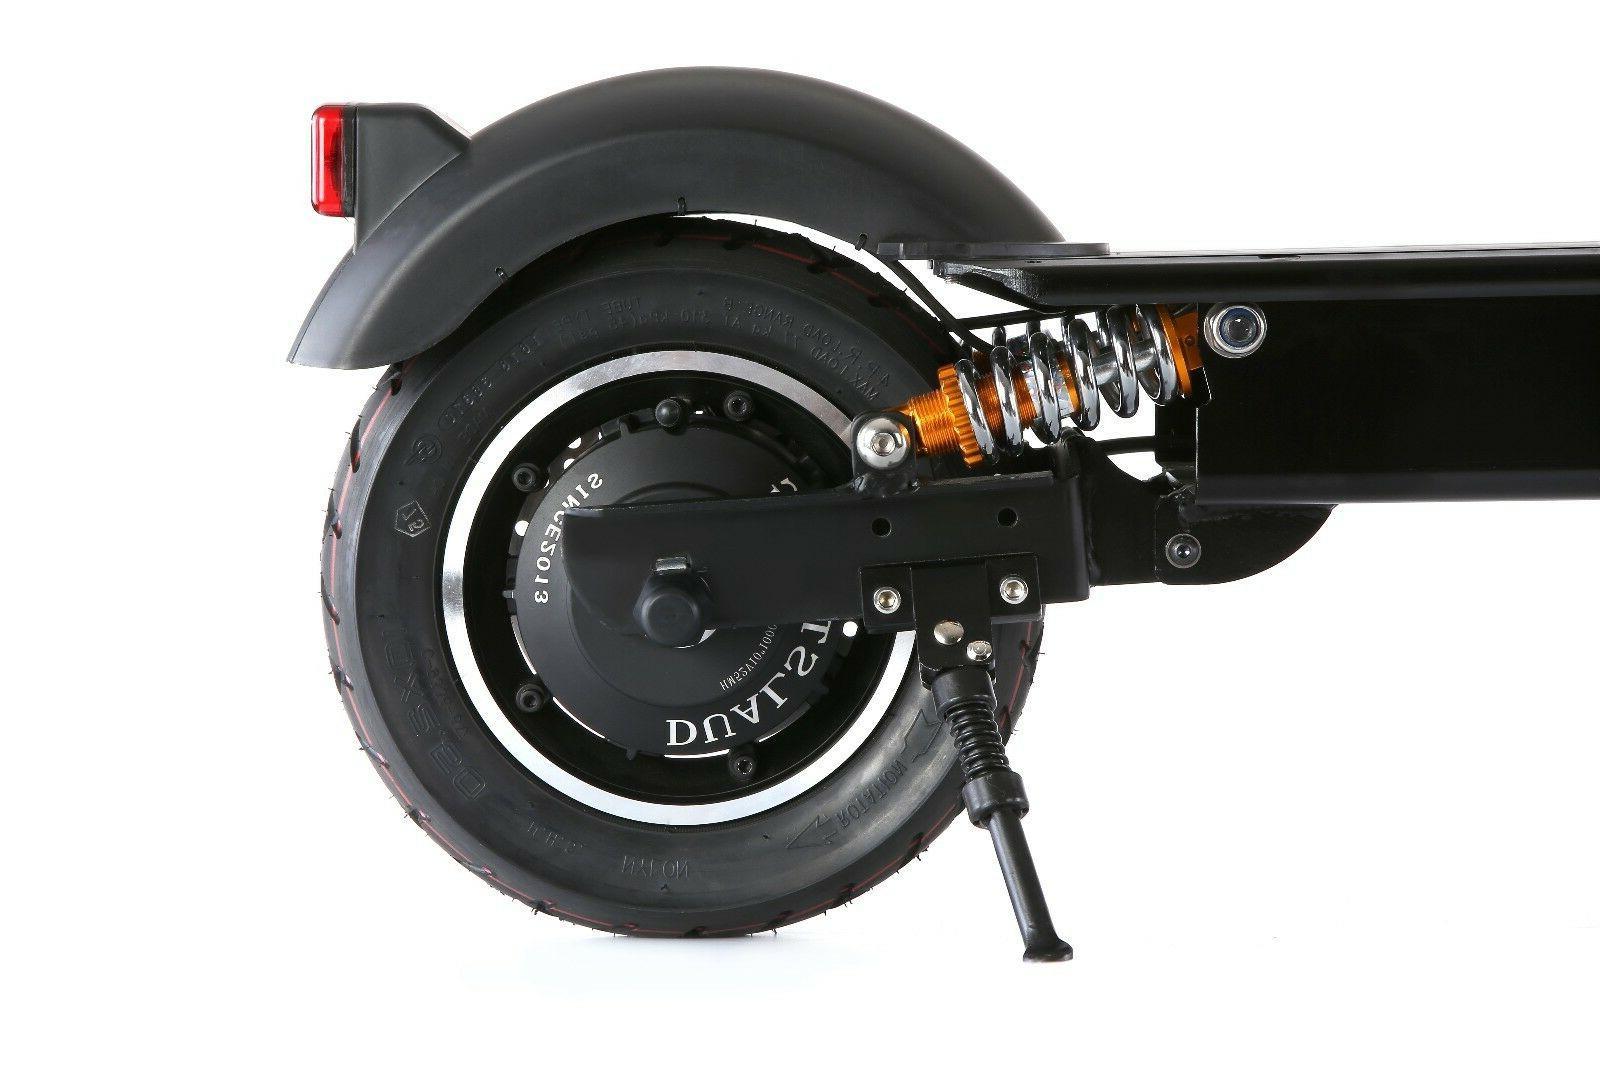 "NANROBOT D4+10"" 2000W Motor Foldable 60km Vehicle Citycoco"